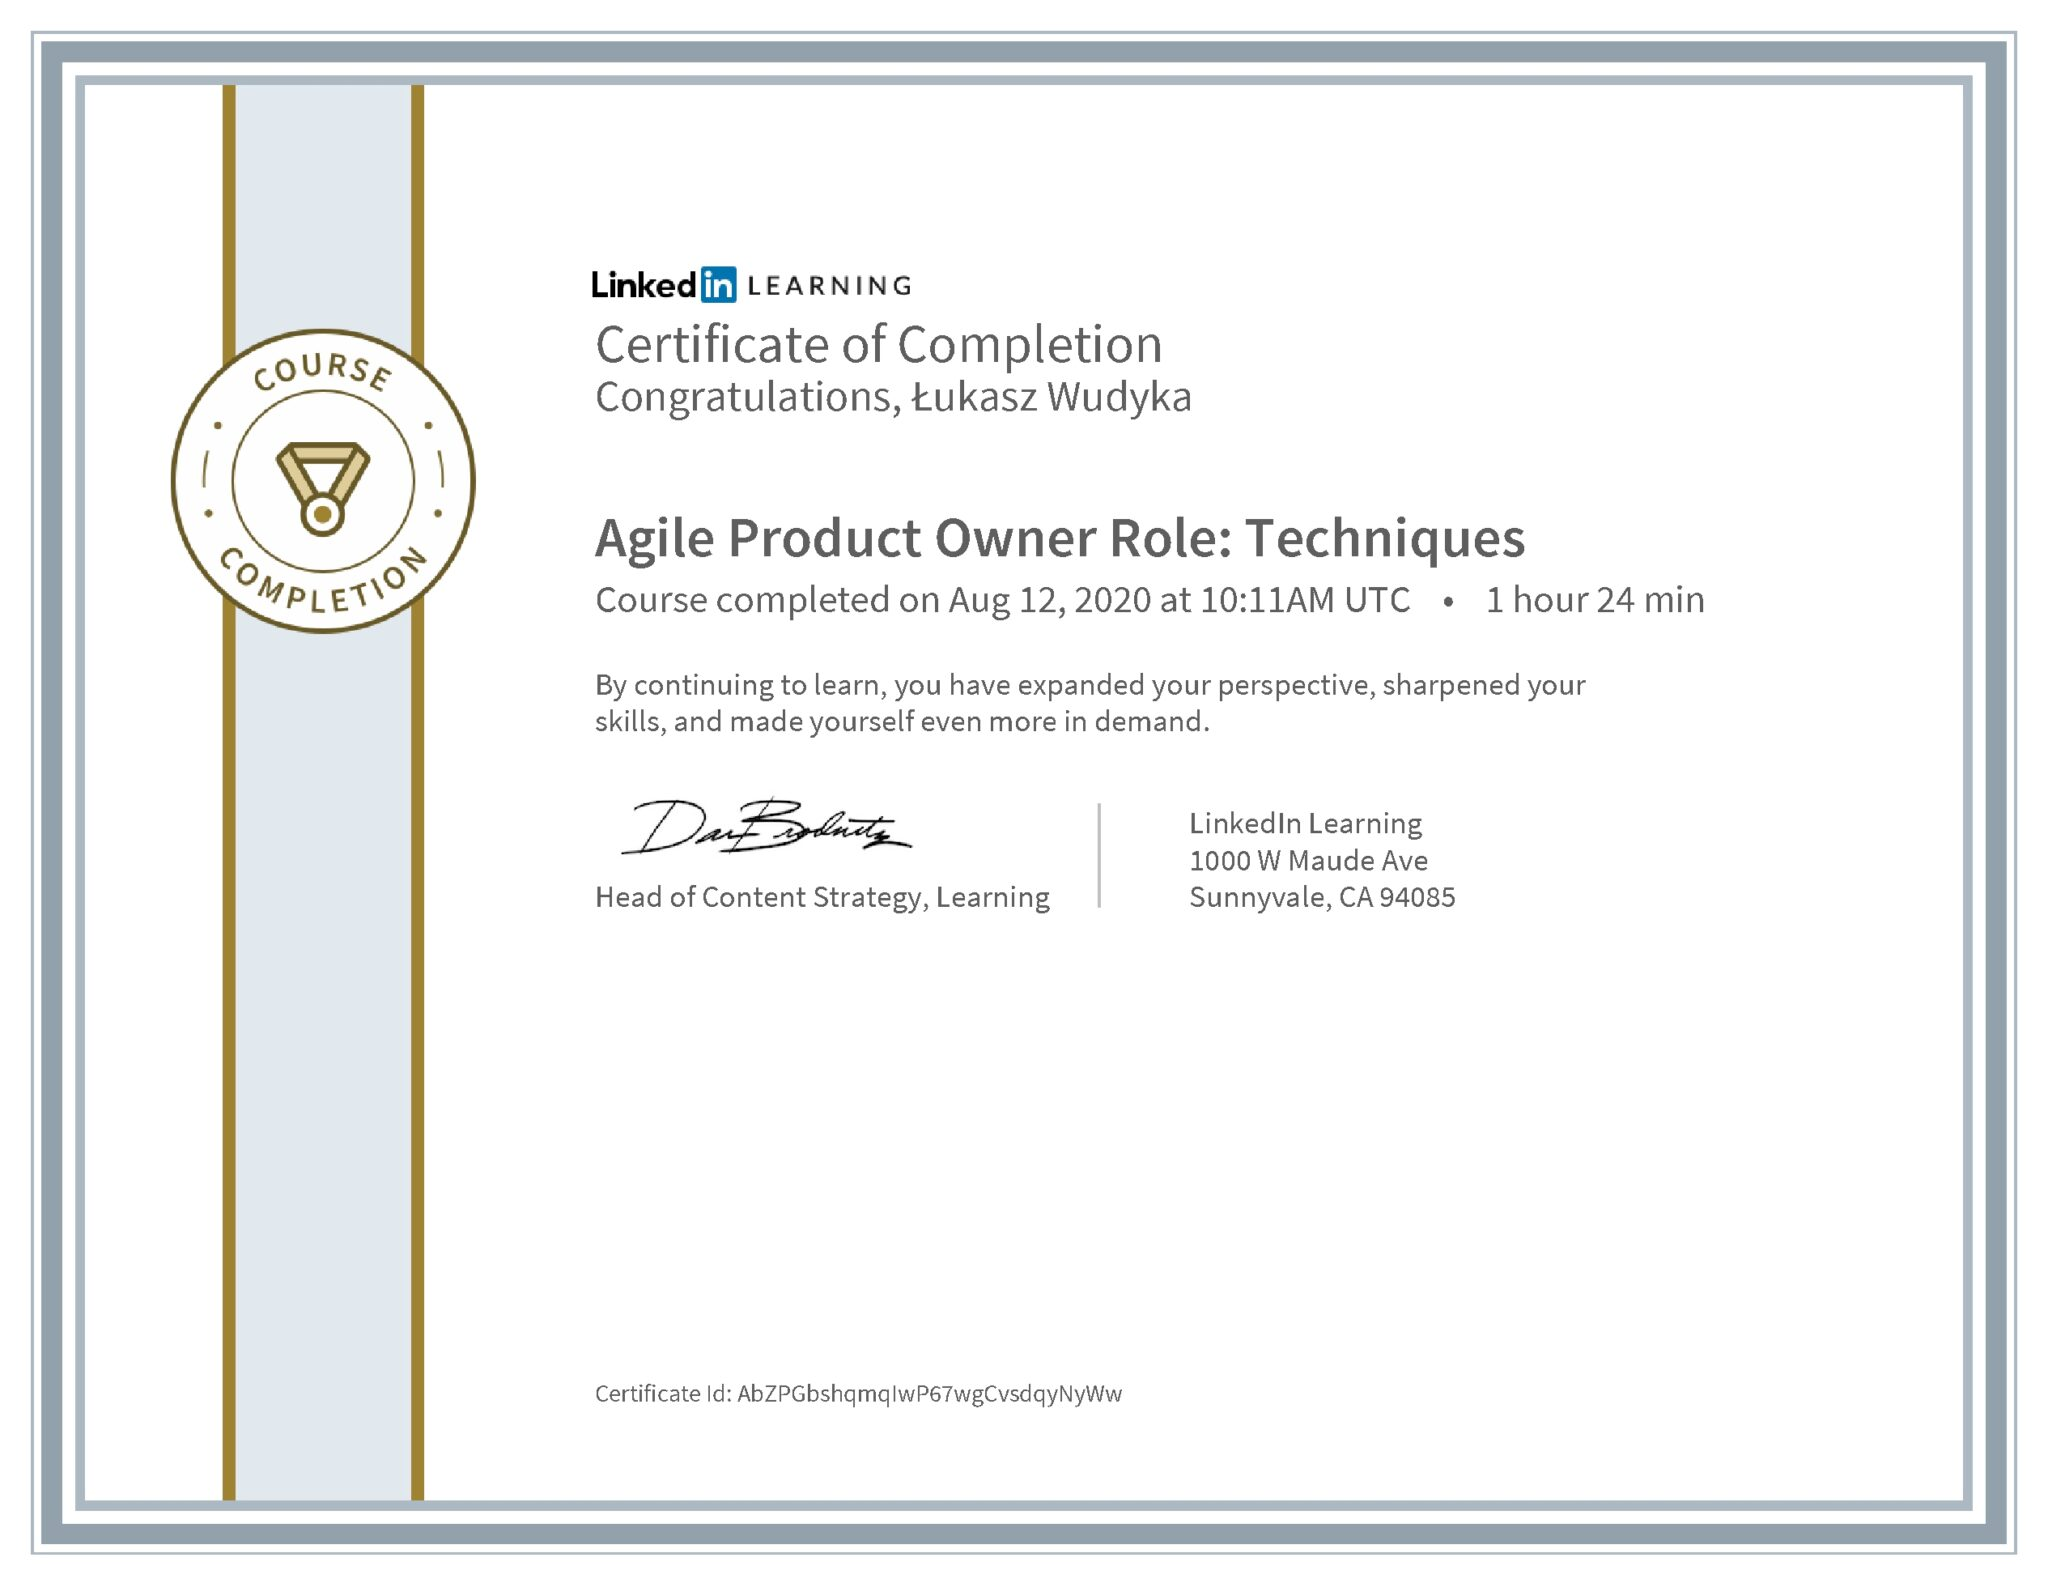 Łukasz Wudyka certyfikat LinkedIn Agile Product Owner Role: Techniques